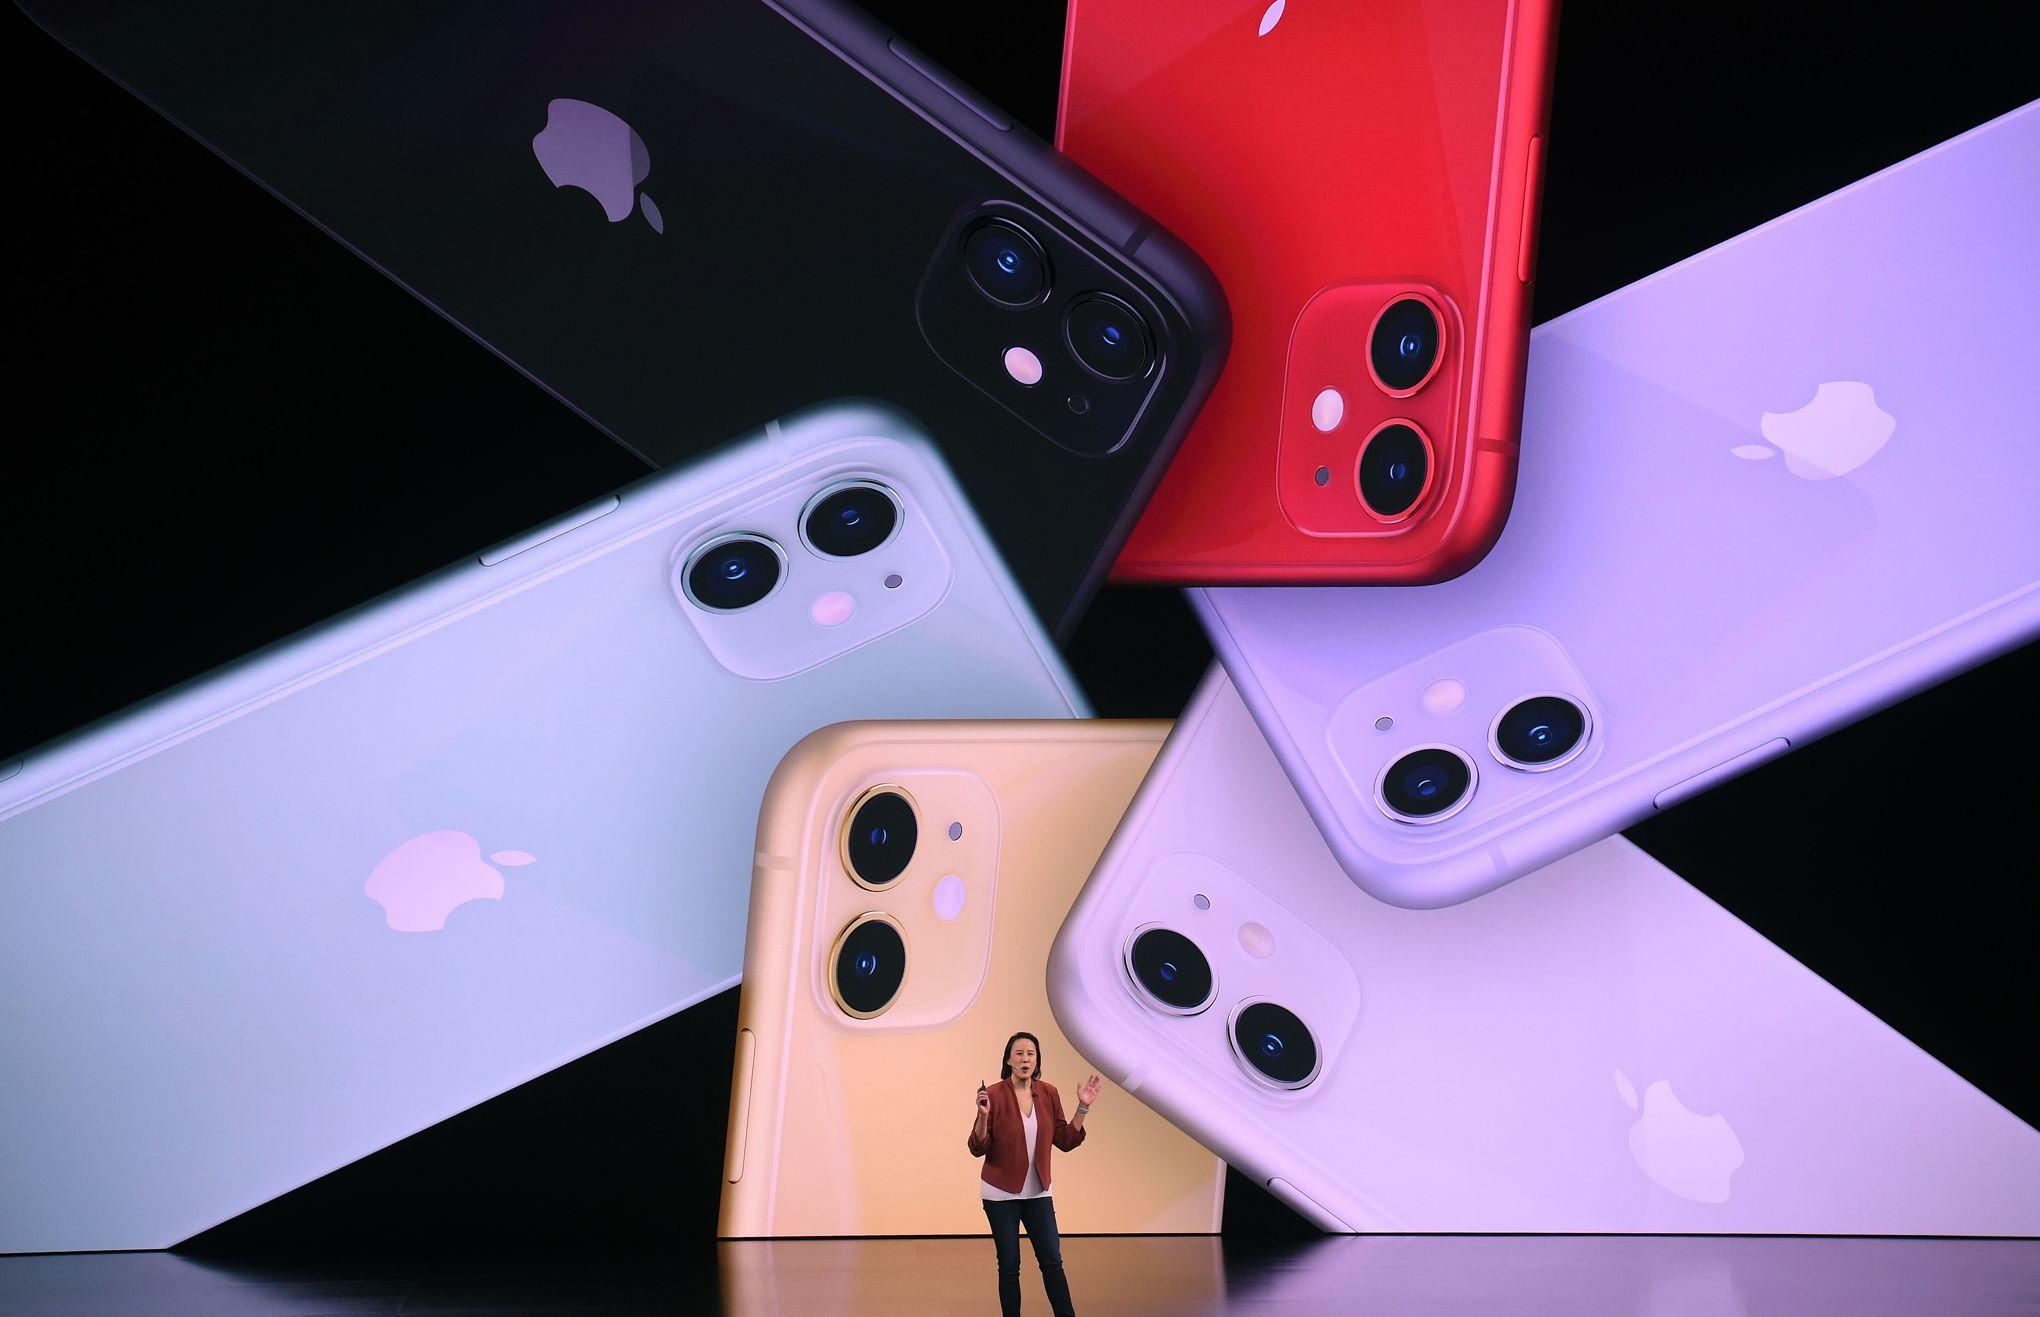 iPhone 11, iPhone 11 Pro, Apple TV+: ce qu'il faut retenir de la keynote d'Apple